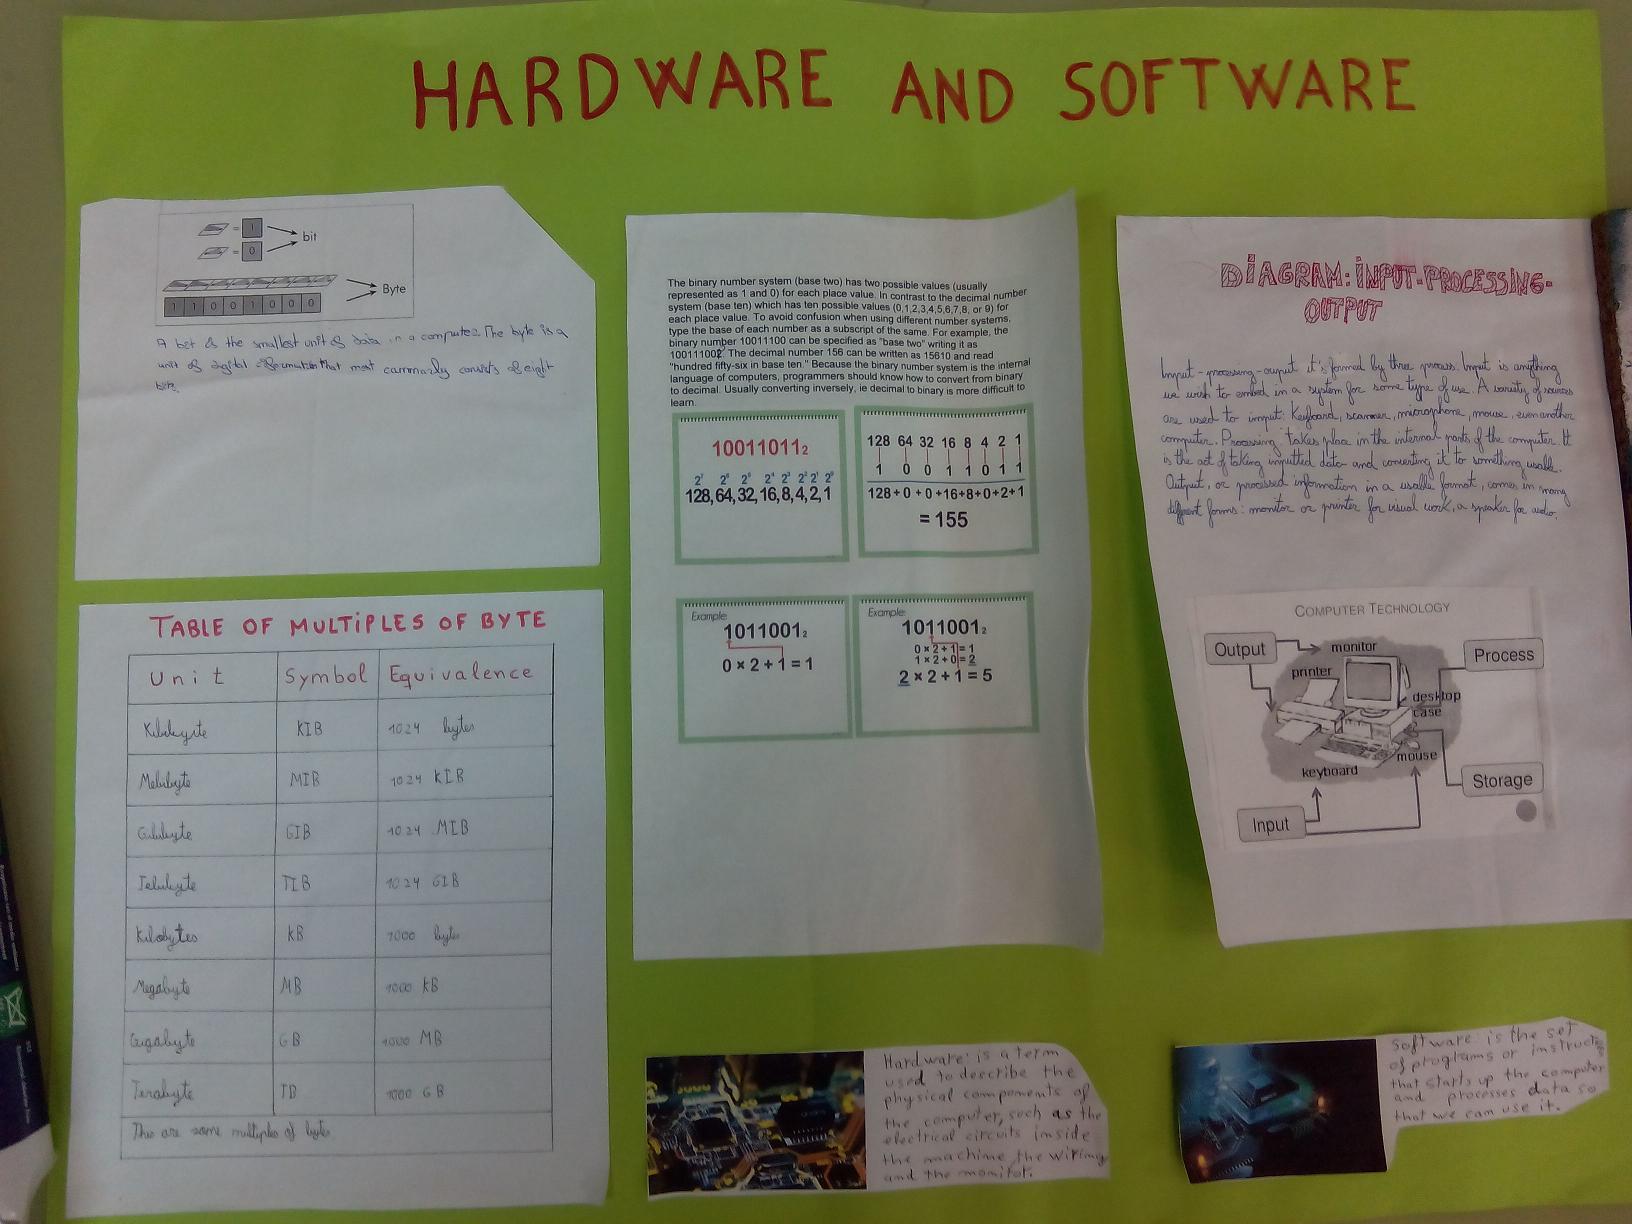 hardware2